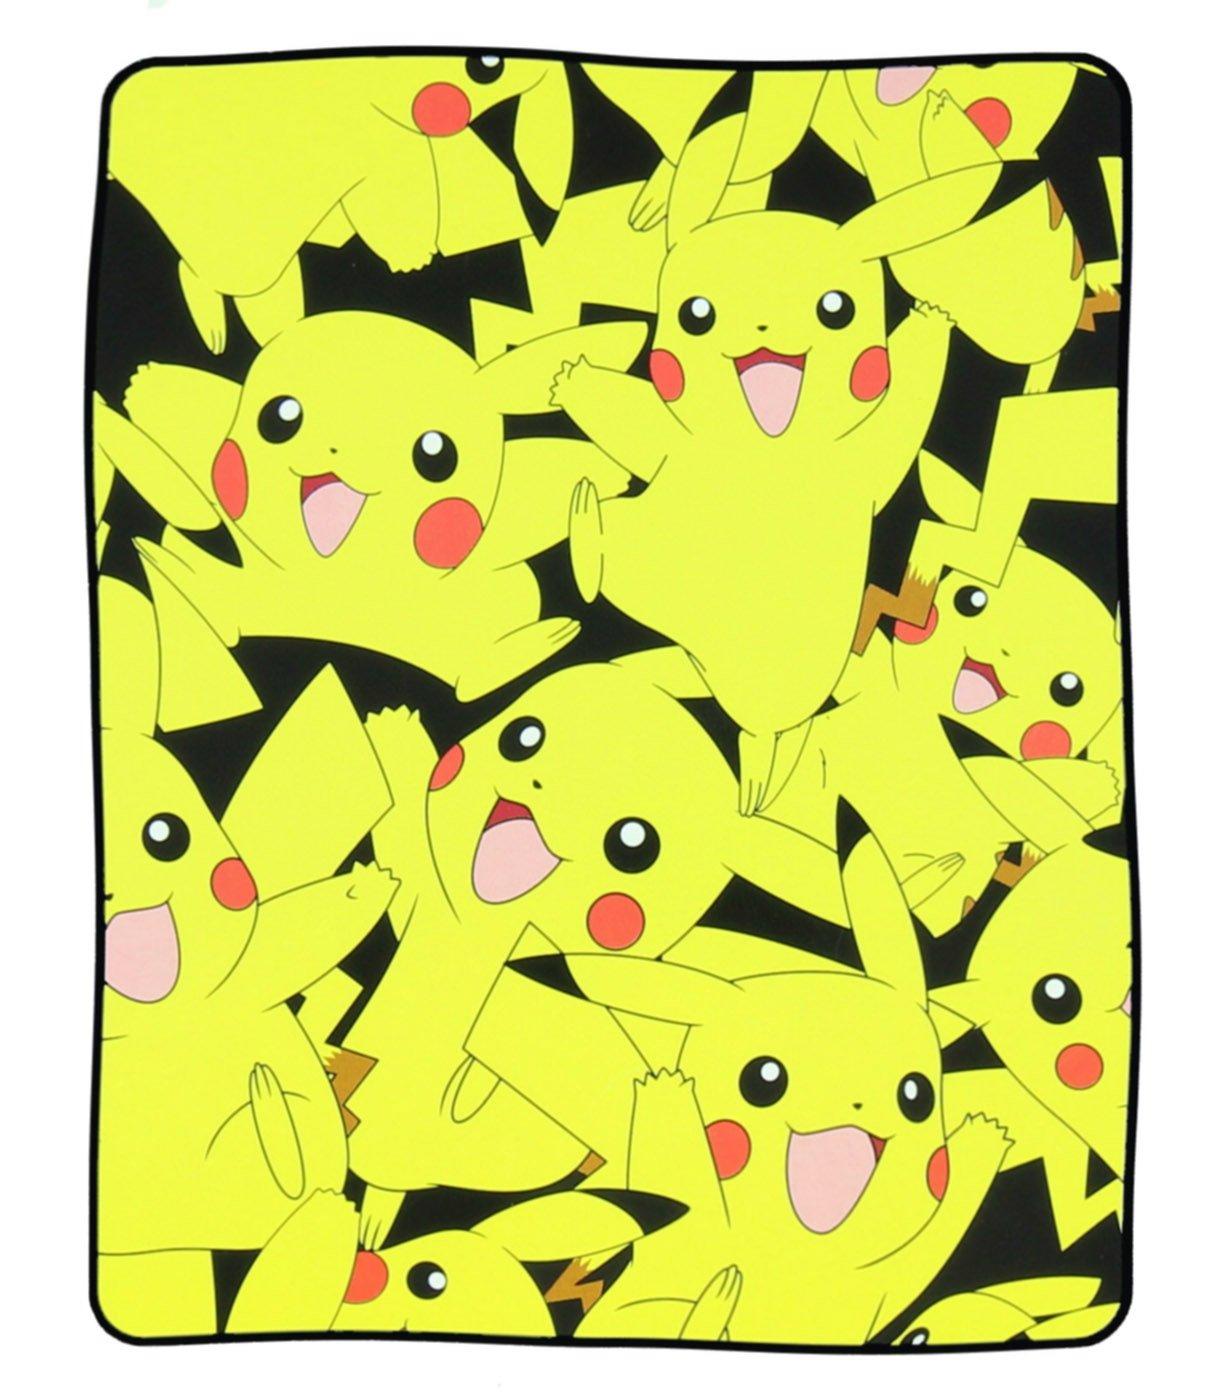 bioWorld Pokémon Pikachu All Over Print Fleece Throw Blanket, 48'' x 60''